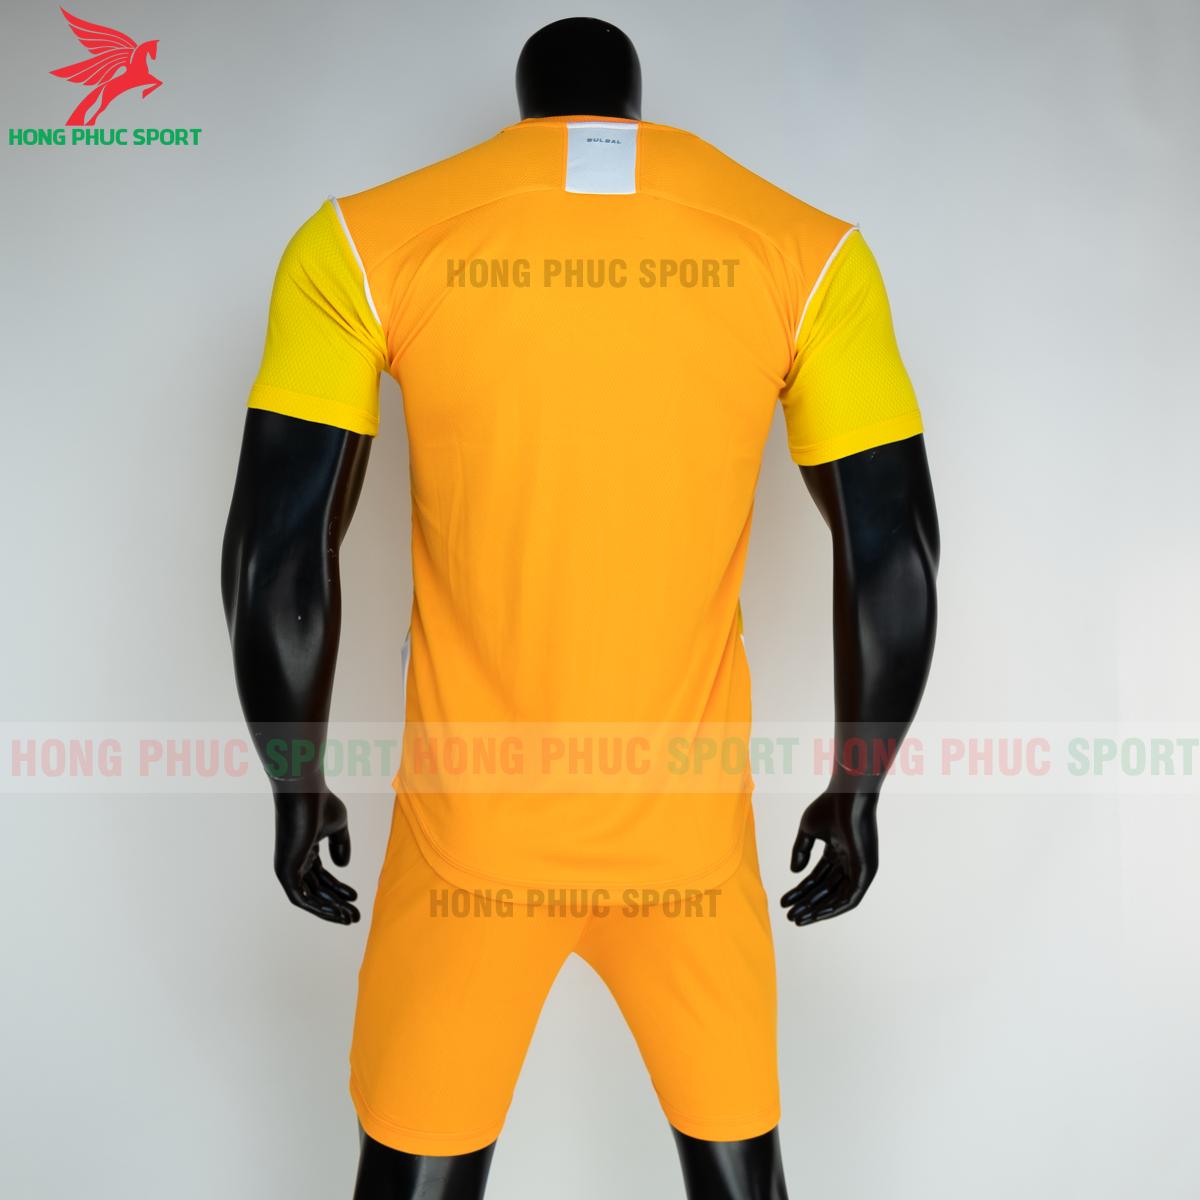 https://cdn.hongphucsport.com/unsafe/s4.shopbay.vn/files/285/ao-bong-da-khong-logo-bulbal-hades-mau-vang-8-604f31f1ab22d.png